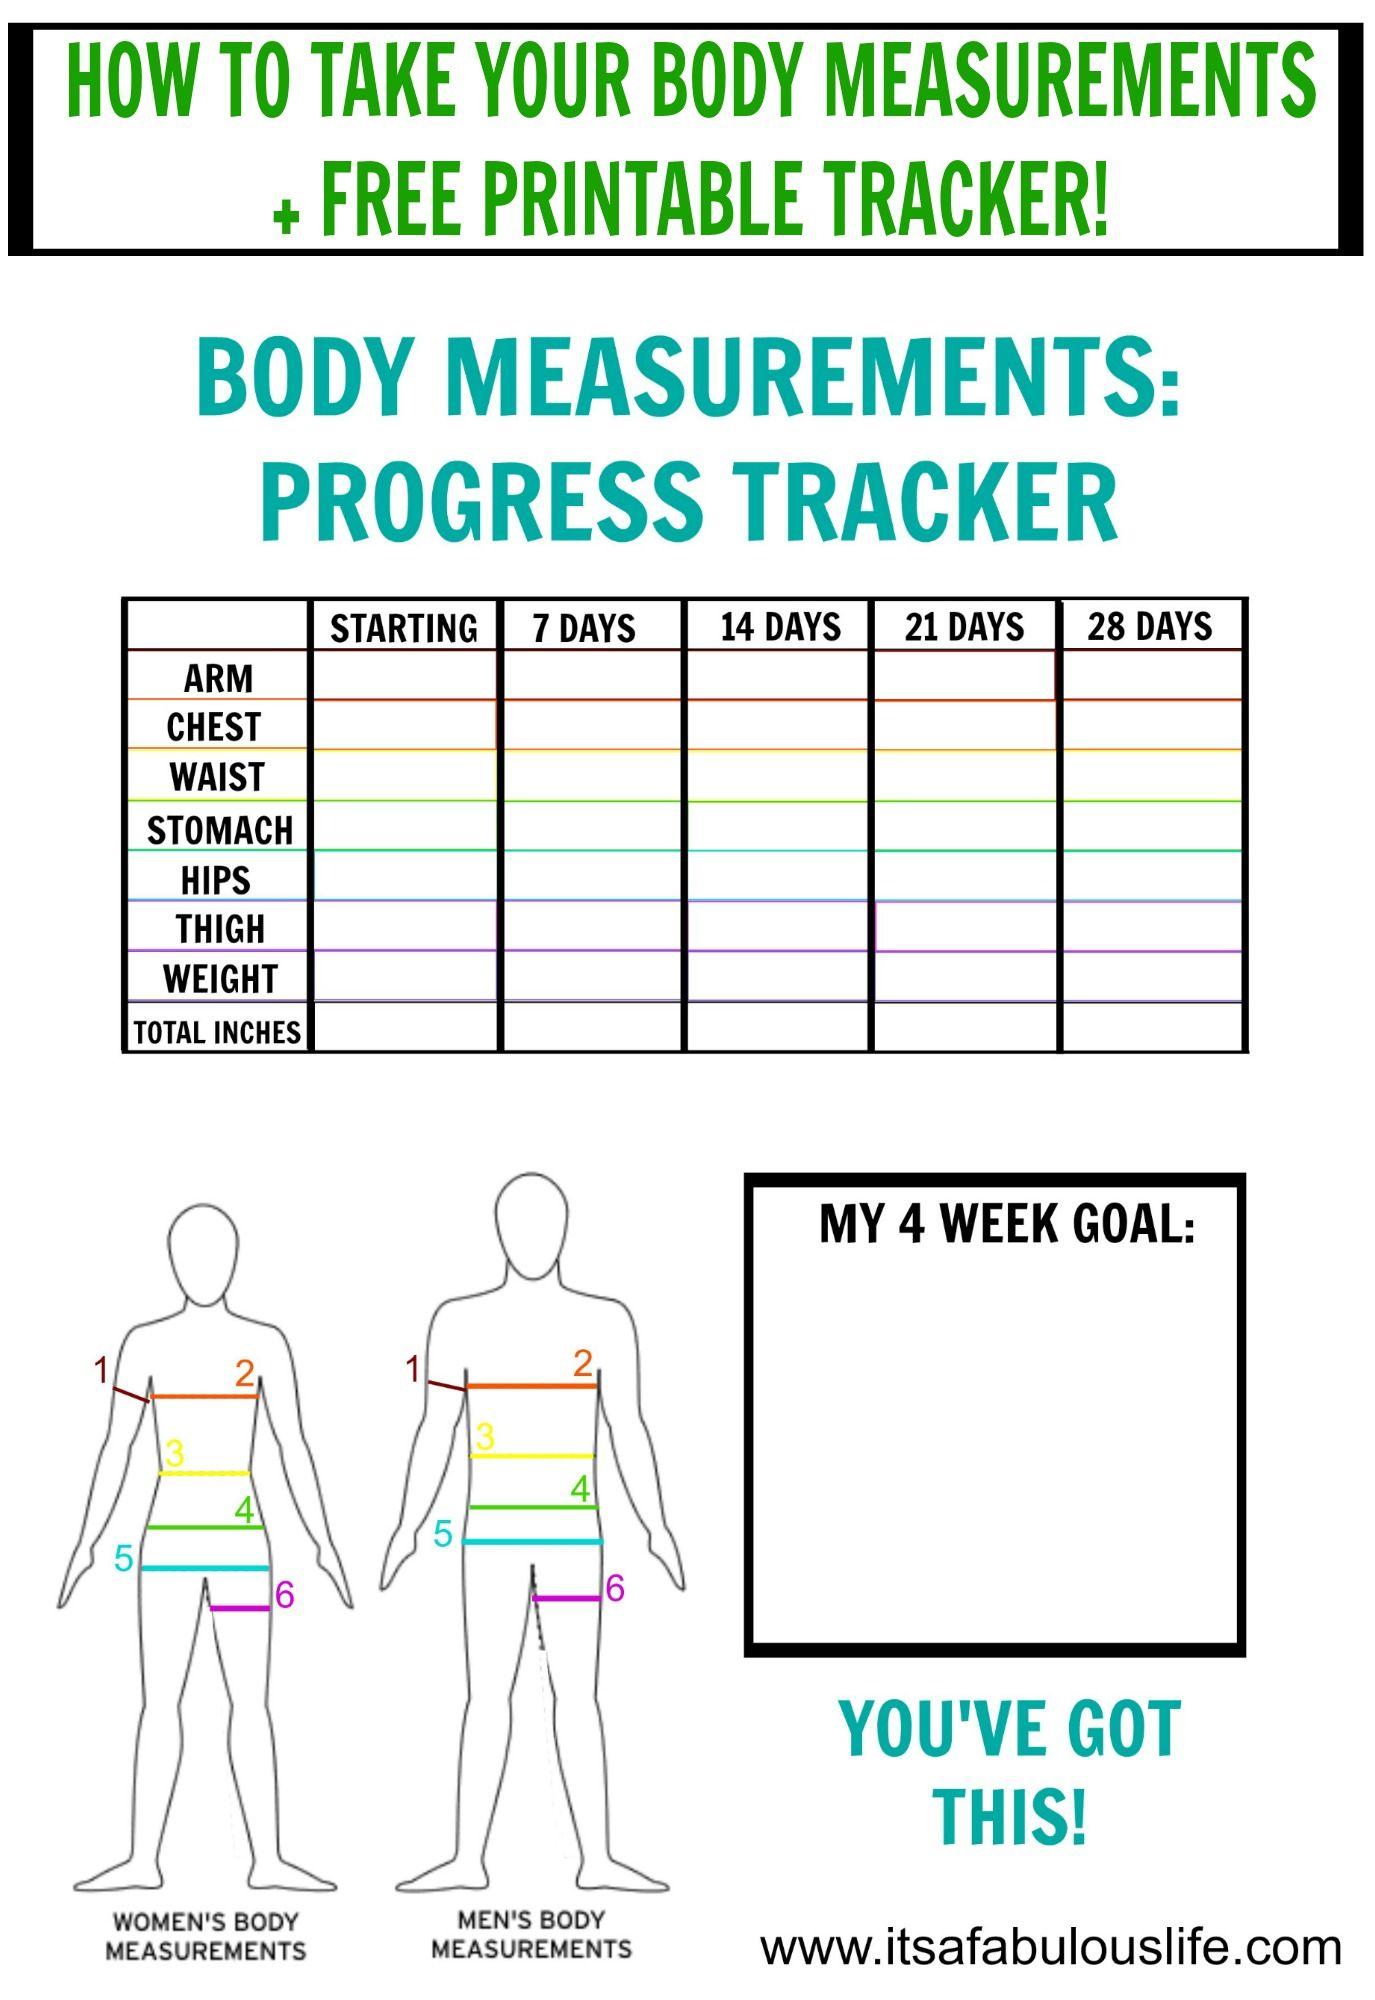 How To Take Body Measurements Free Printable